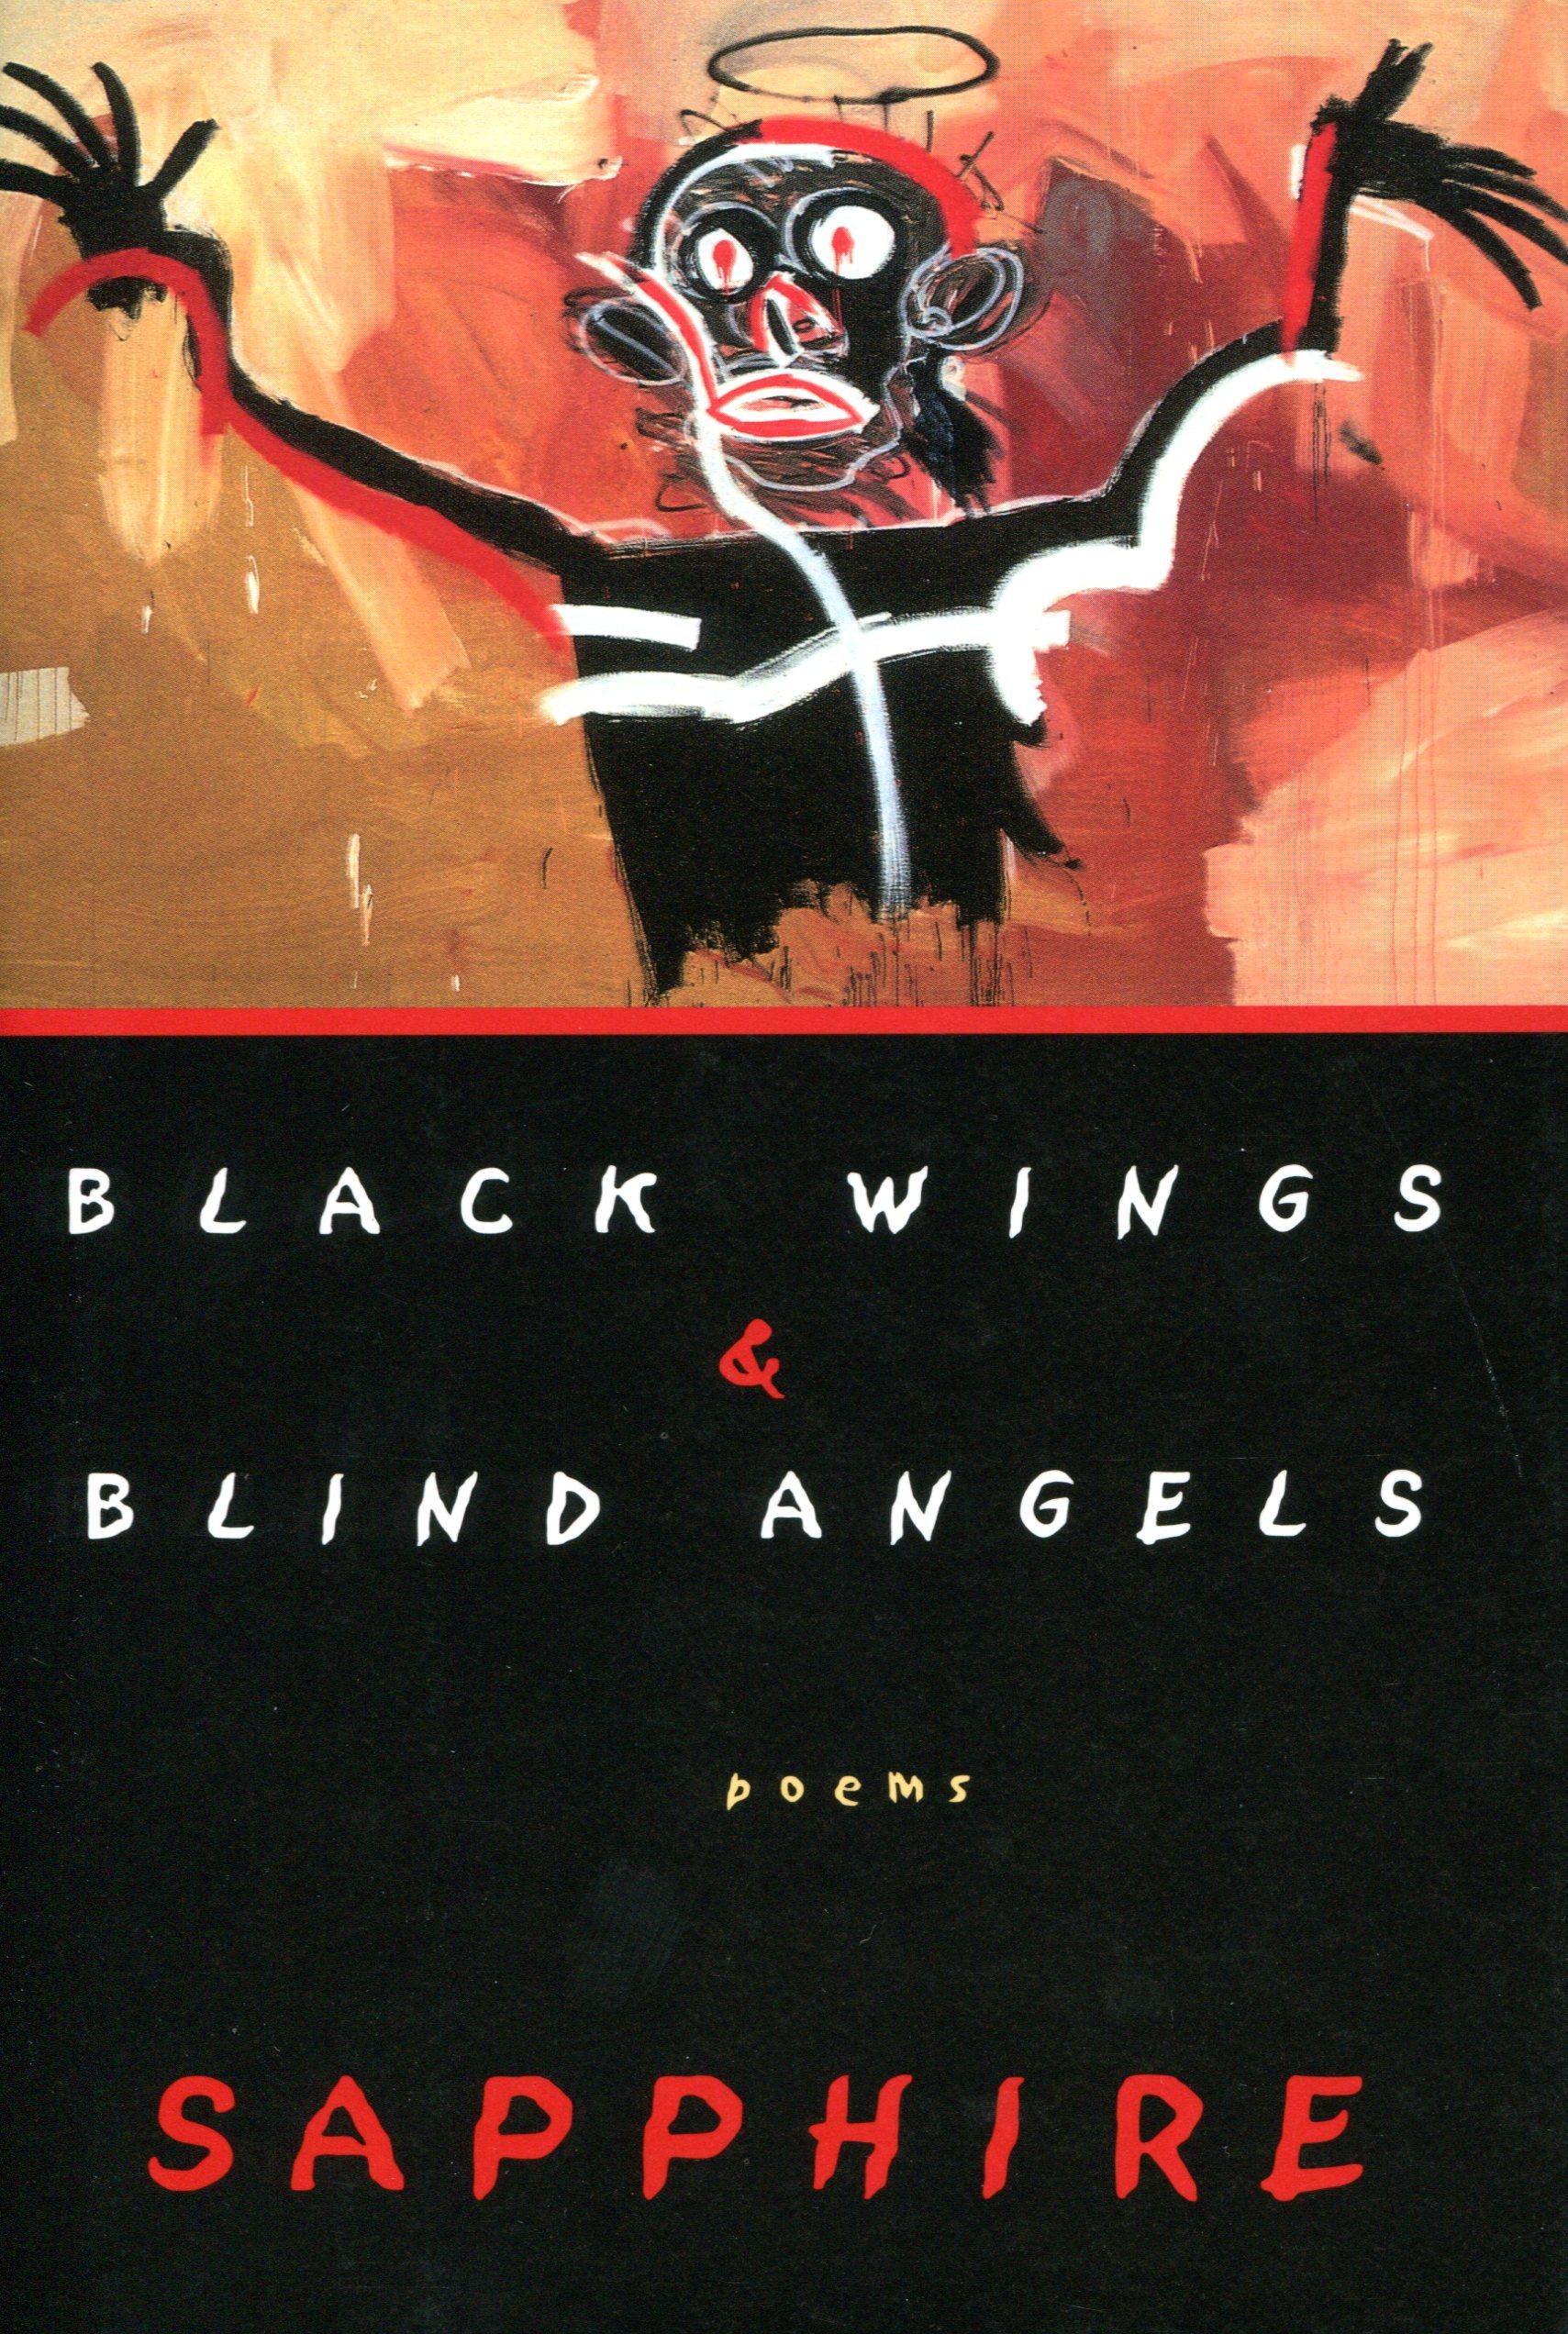 Black Wings & Blind Angels by Sapphire